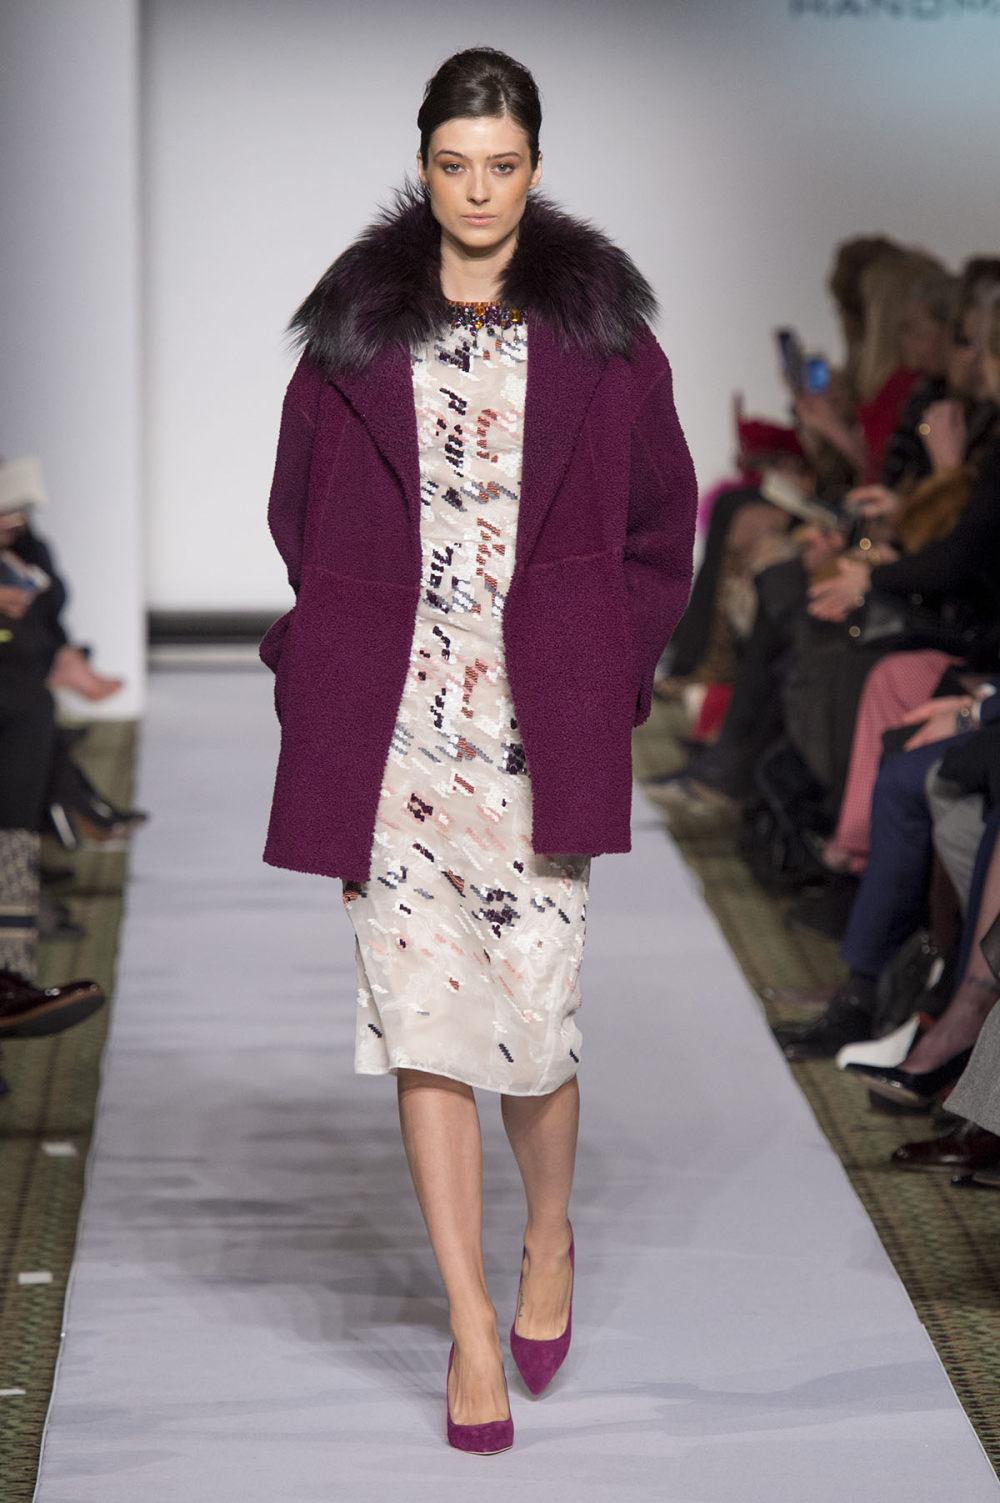 Carolina Herrera时装系列用鲜艳的颜色充满智能的黑白色调-21.jpg